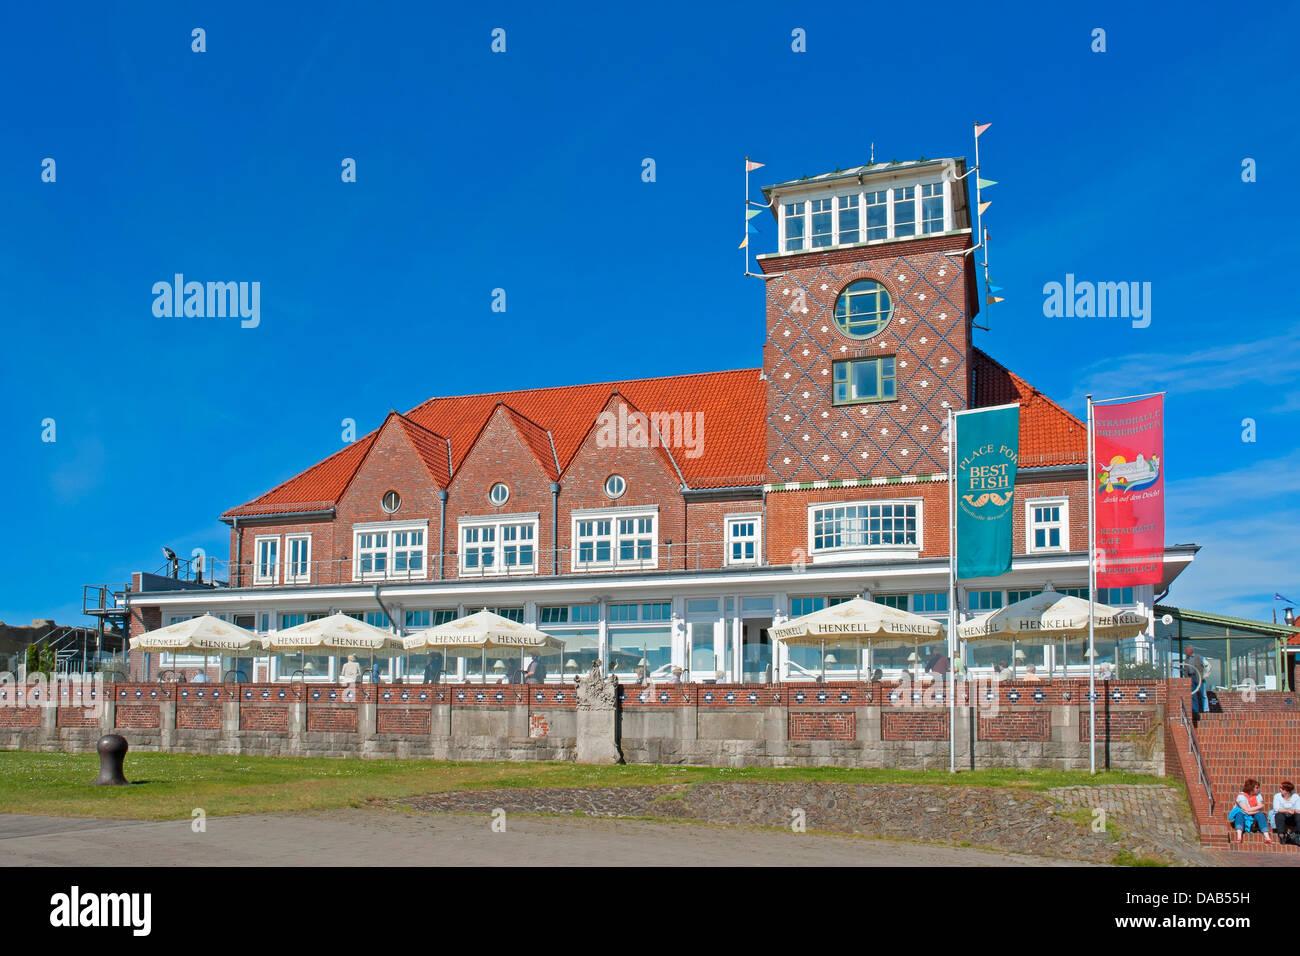 Europe, Germany, Bremen, Bremerhaven, Hermann-Heinrich-Meier-Strasse, new harbour, port, restaurant, beach hall, - Stock Image